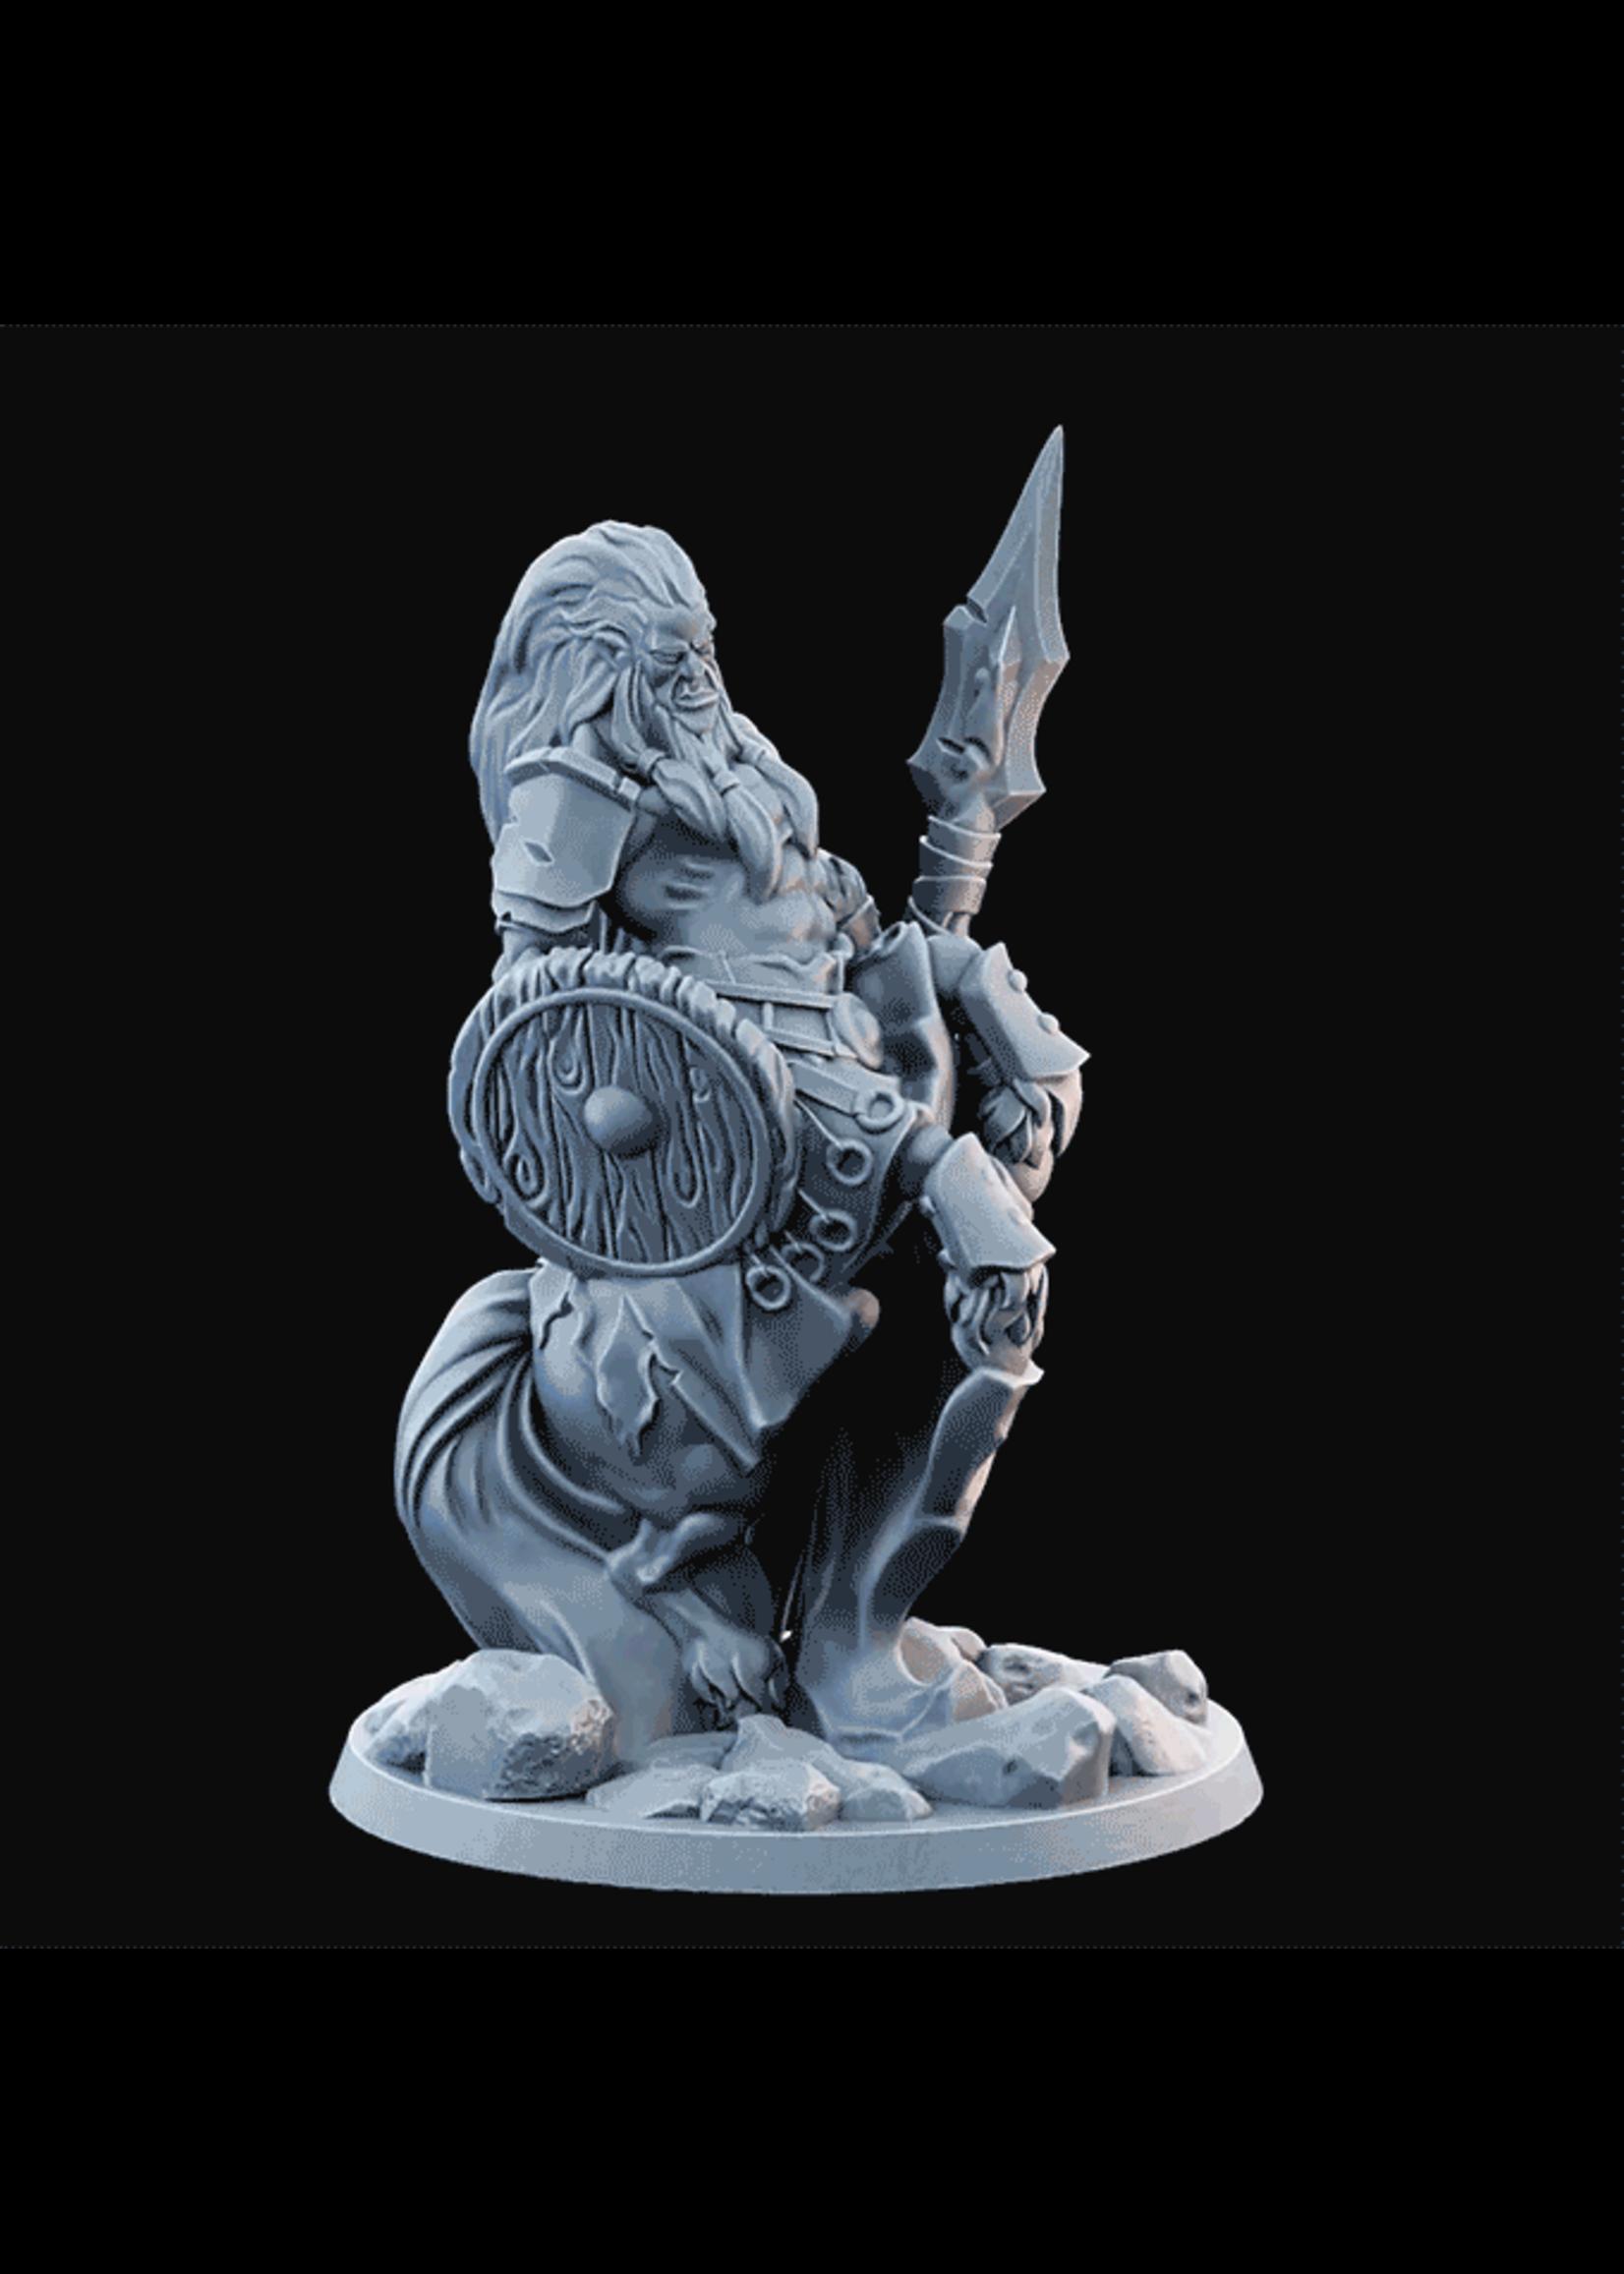 3D Printed Miniature - Centaur 03 Spear  - Dungeons & Dragons - Desolate Plains KS